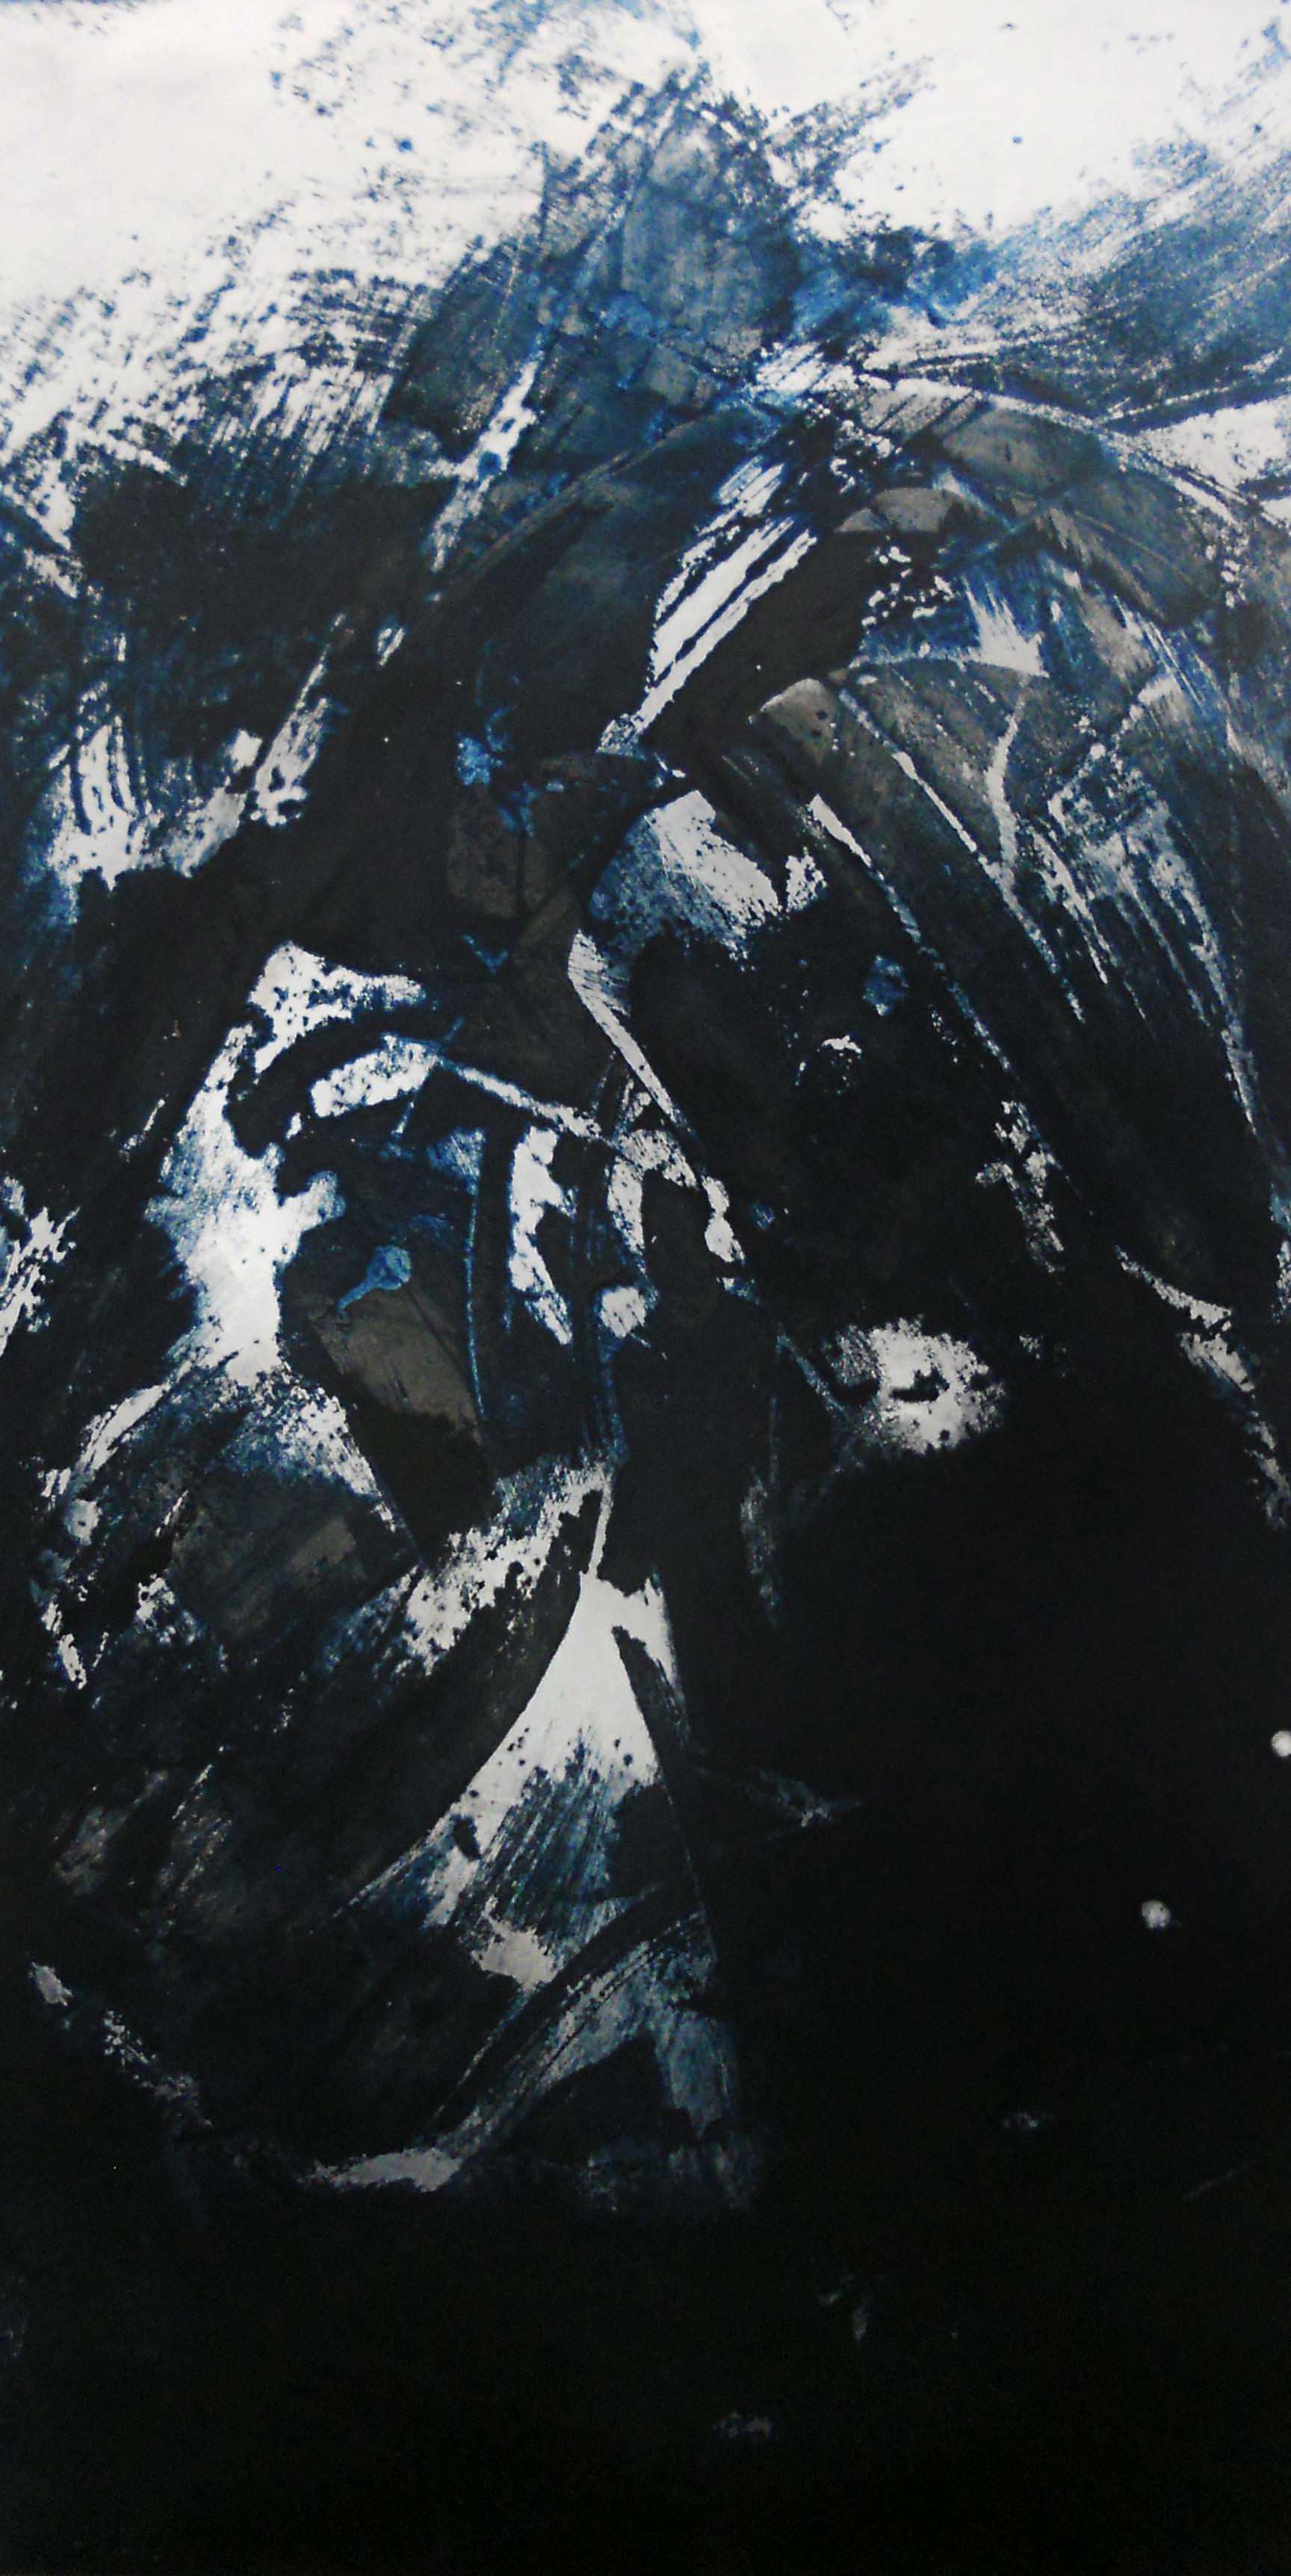 Surge,2014    Mixed media on aluminum // 24 x 48 inches